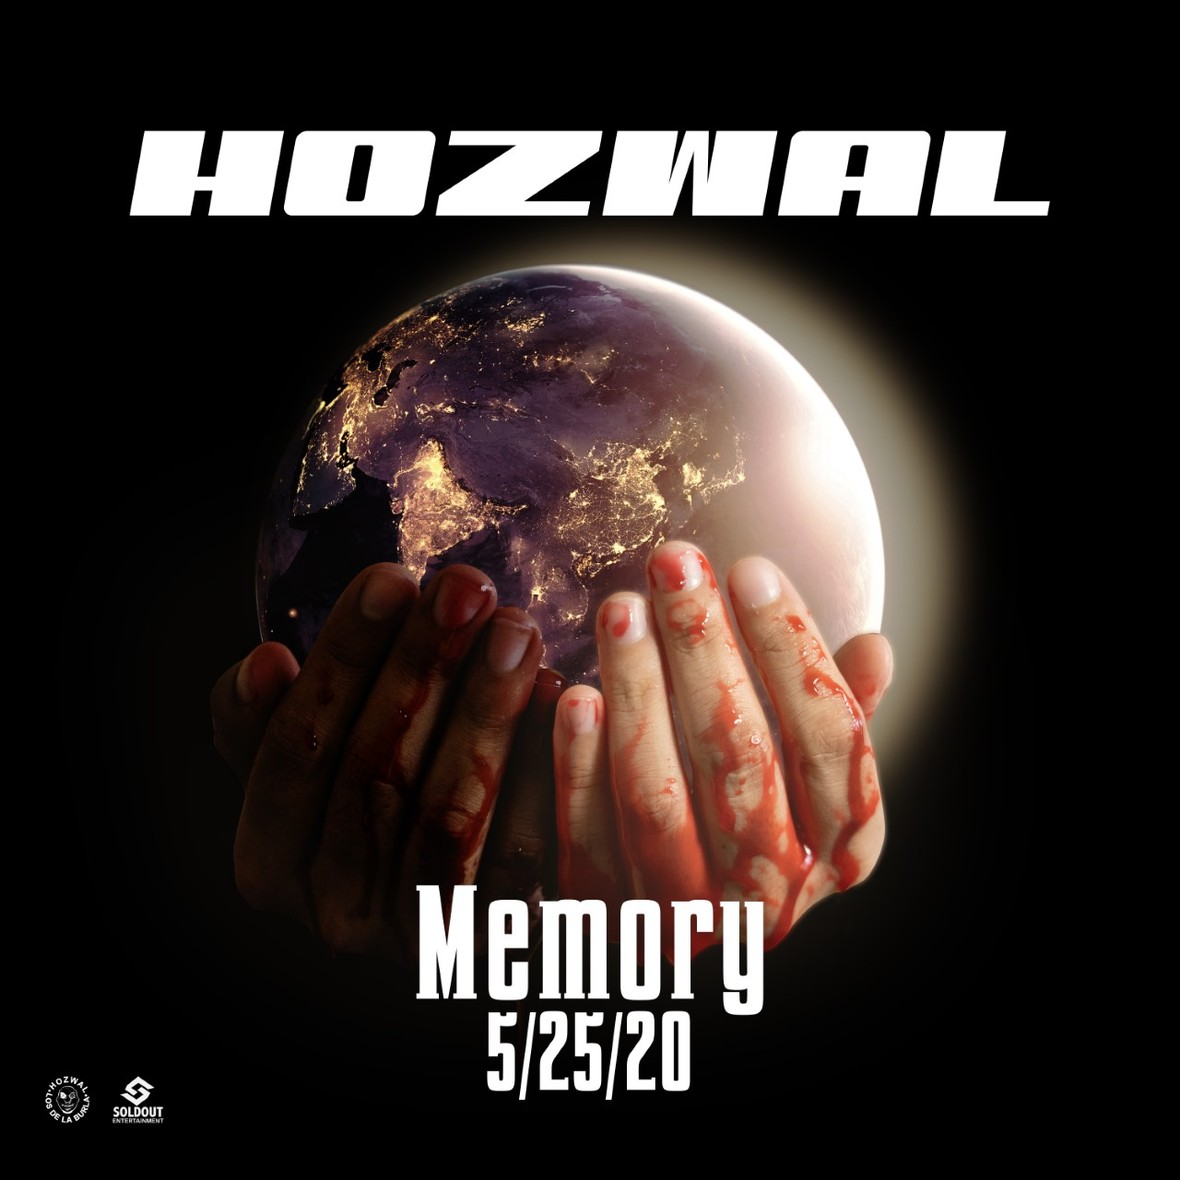 thumbnail MEMORY